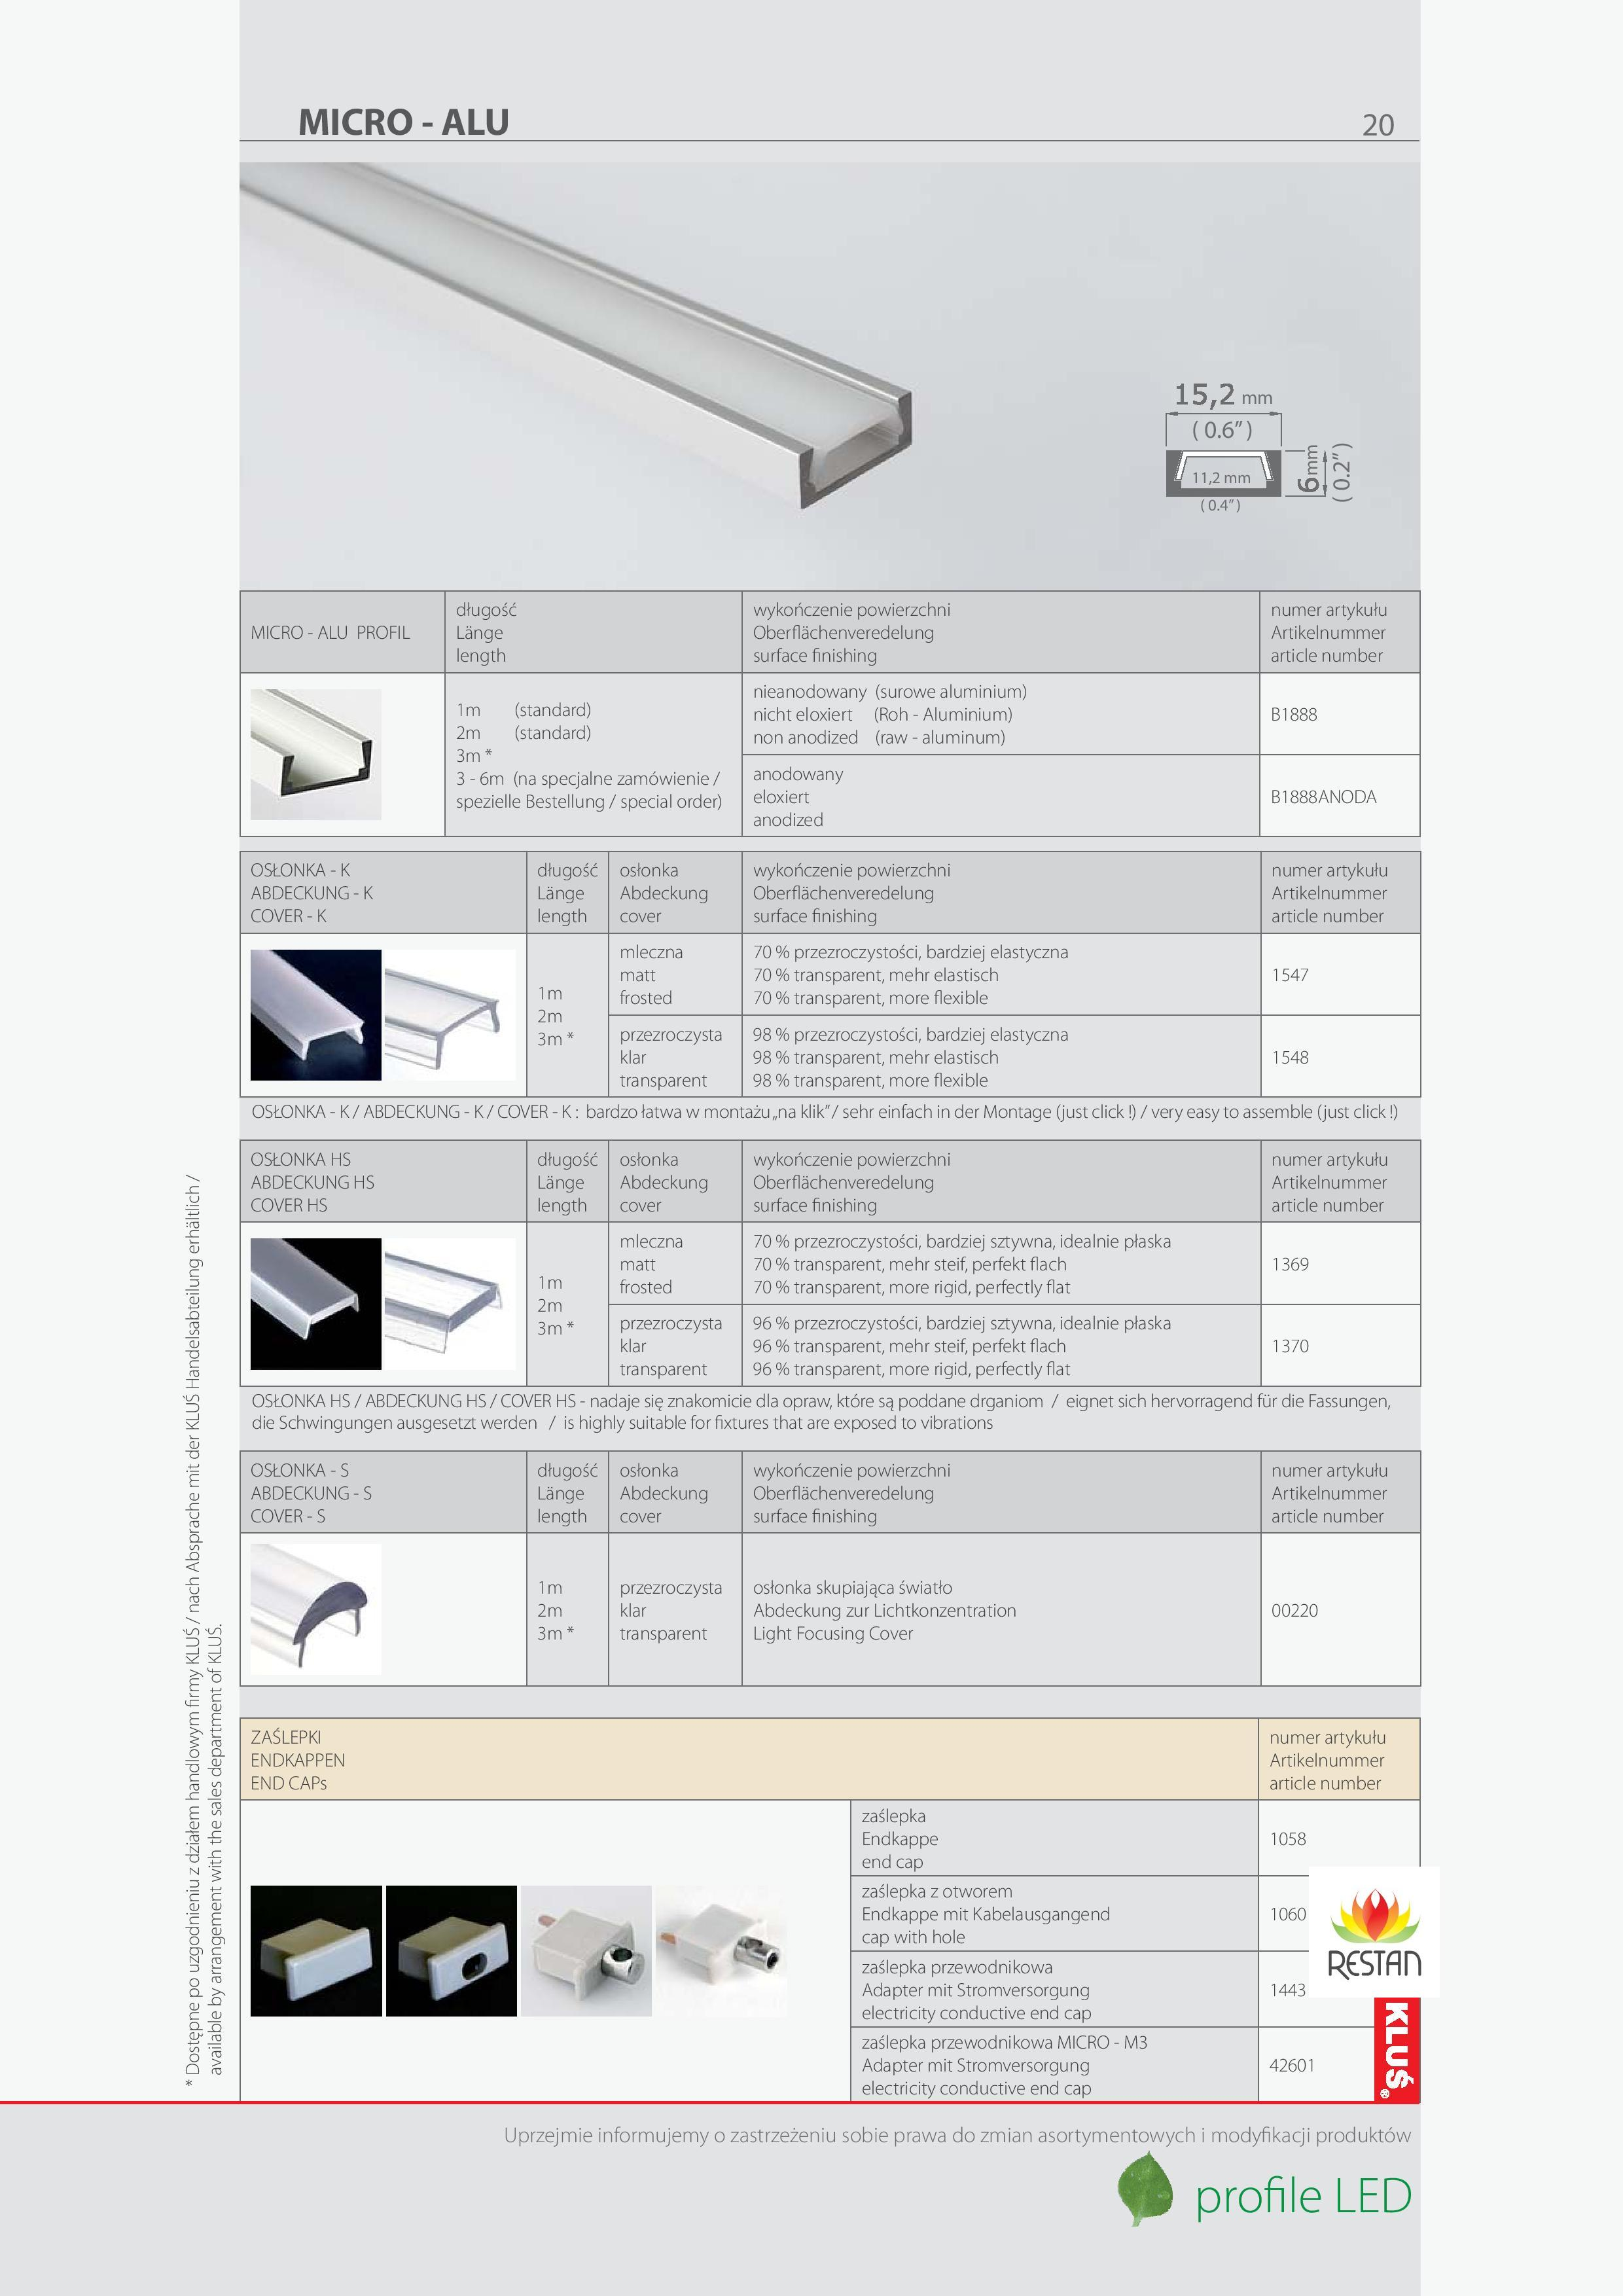 Hliníkové profily pro schody, Hliníkové profily